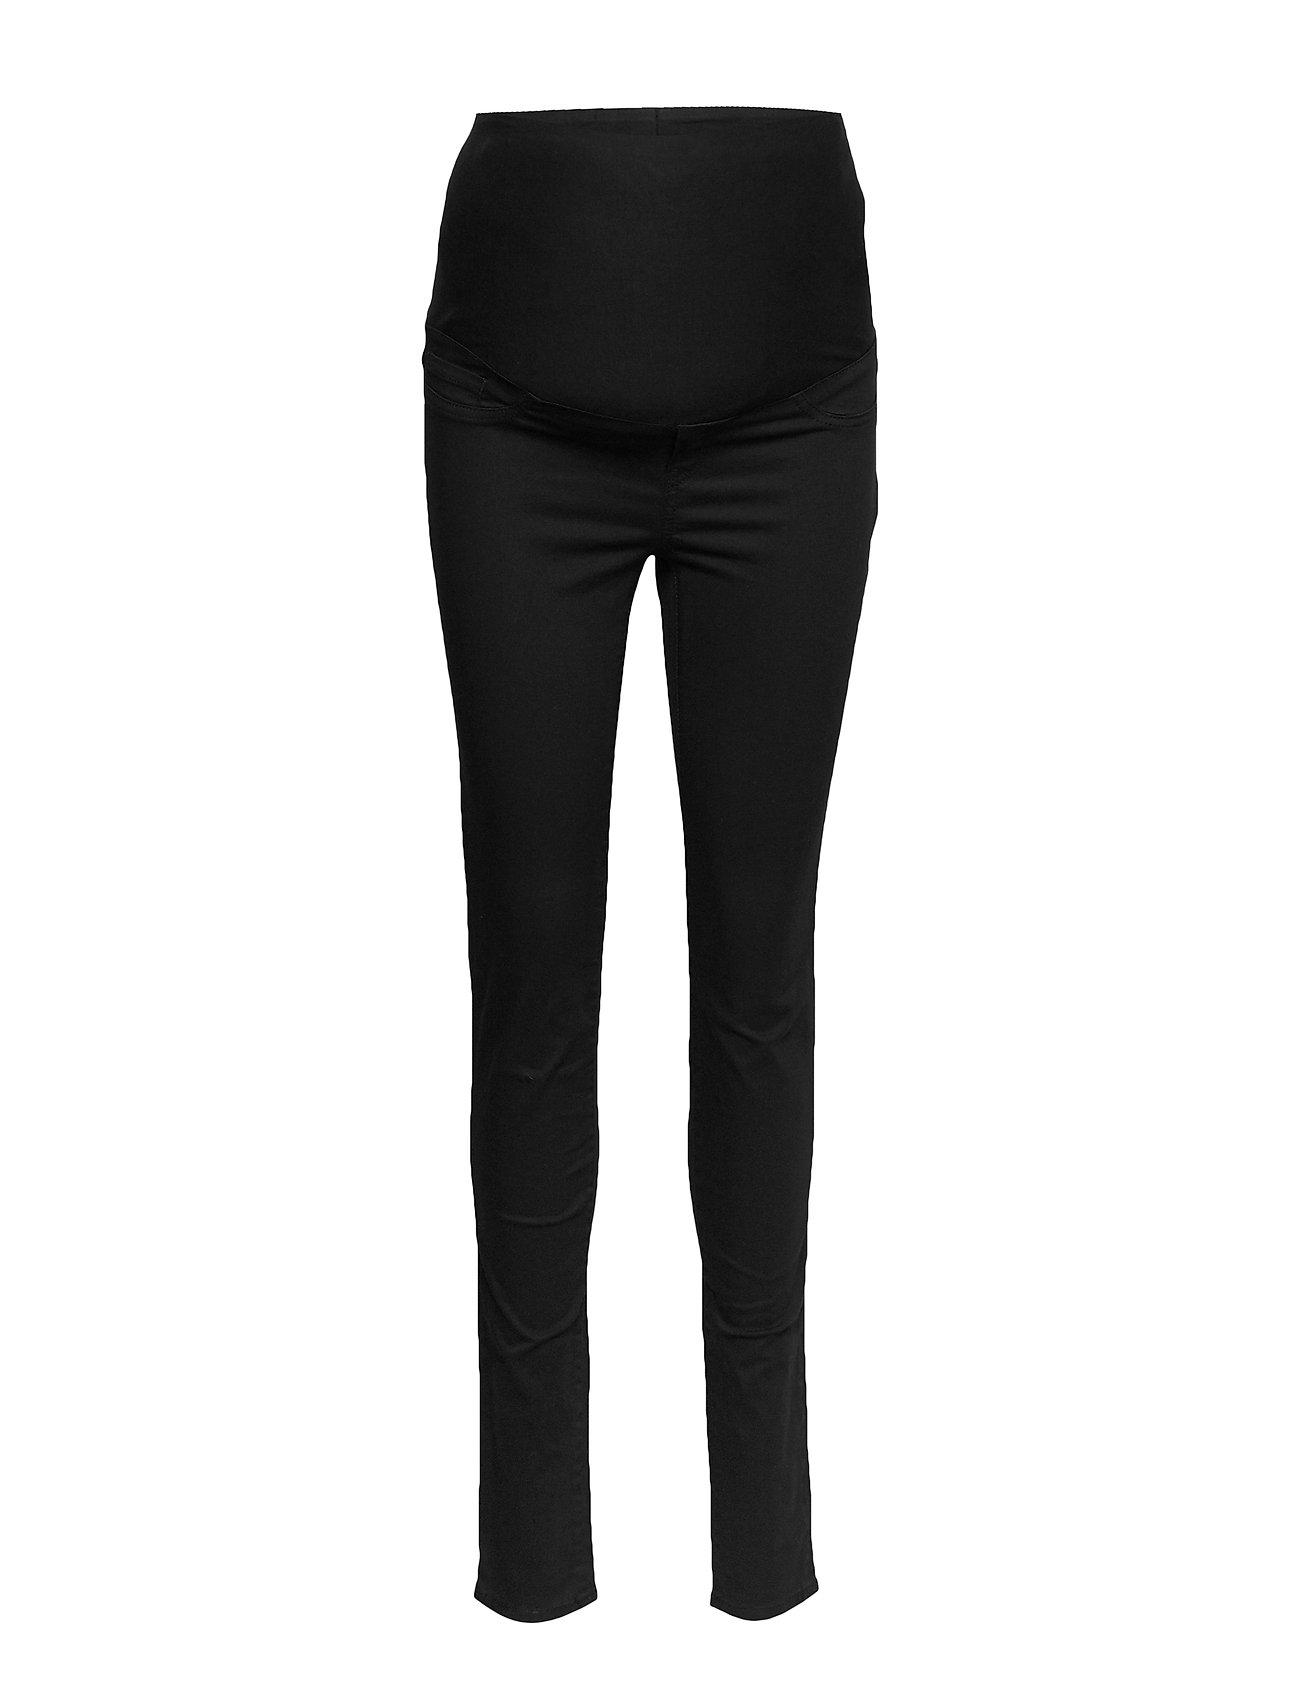 Lindex Trousers MOM Slim black - BLACK